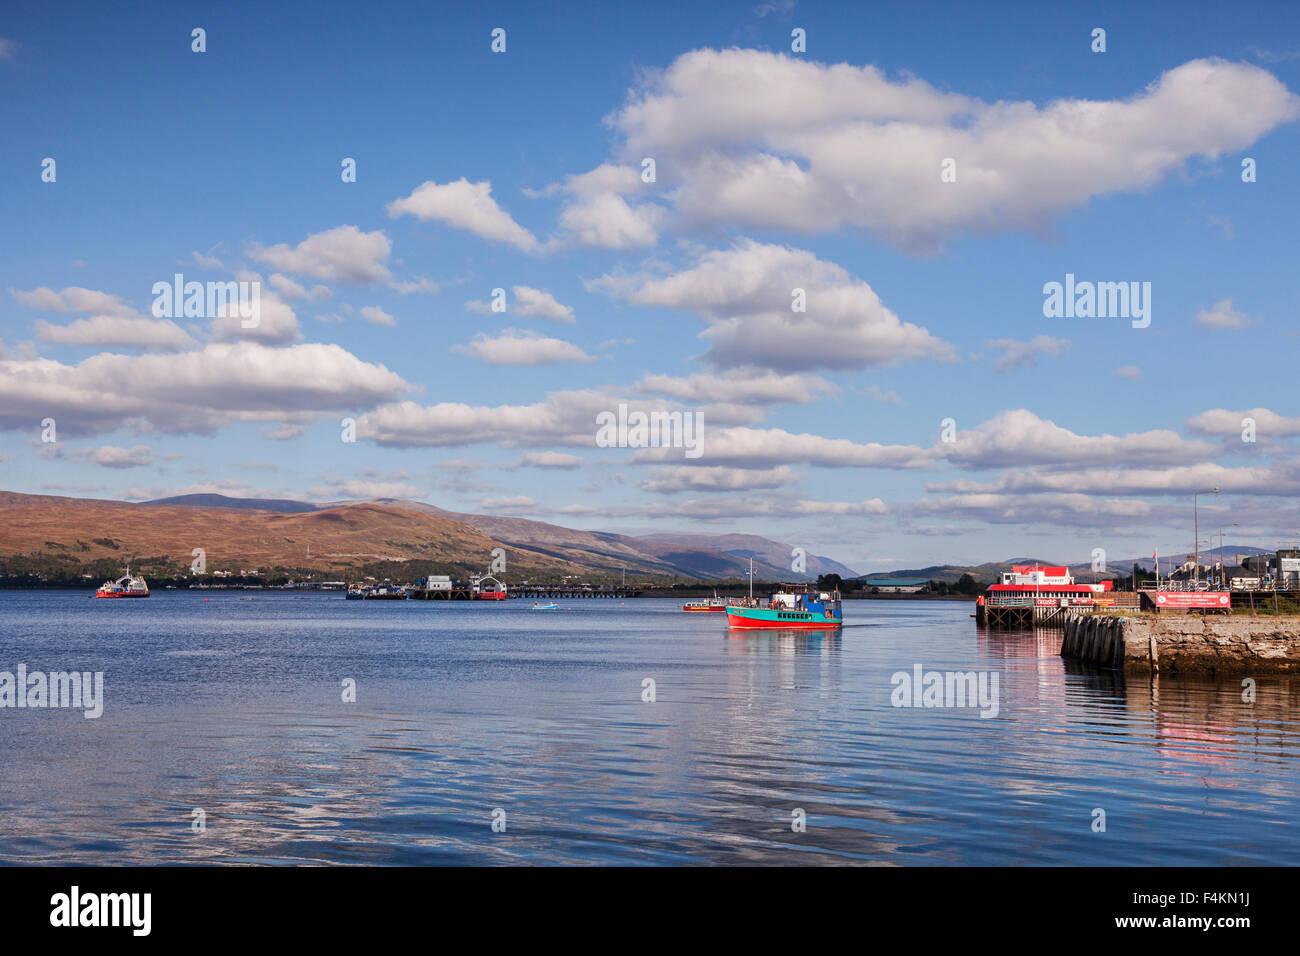 Loch Linnhe, Fort William, Highland, Scotland, UK - Stock Image